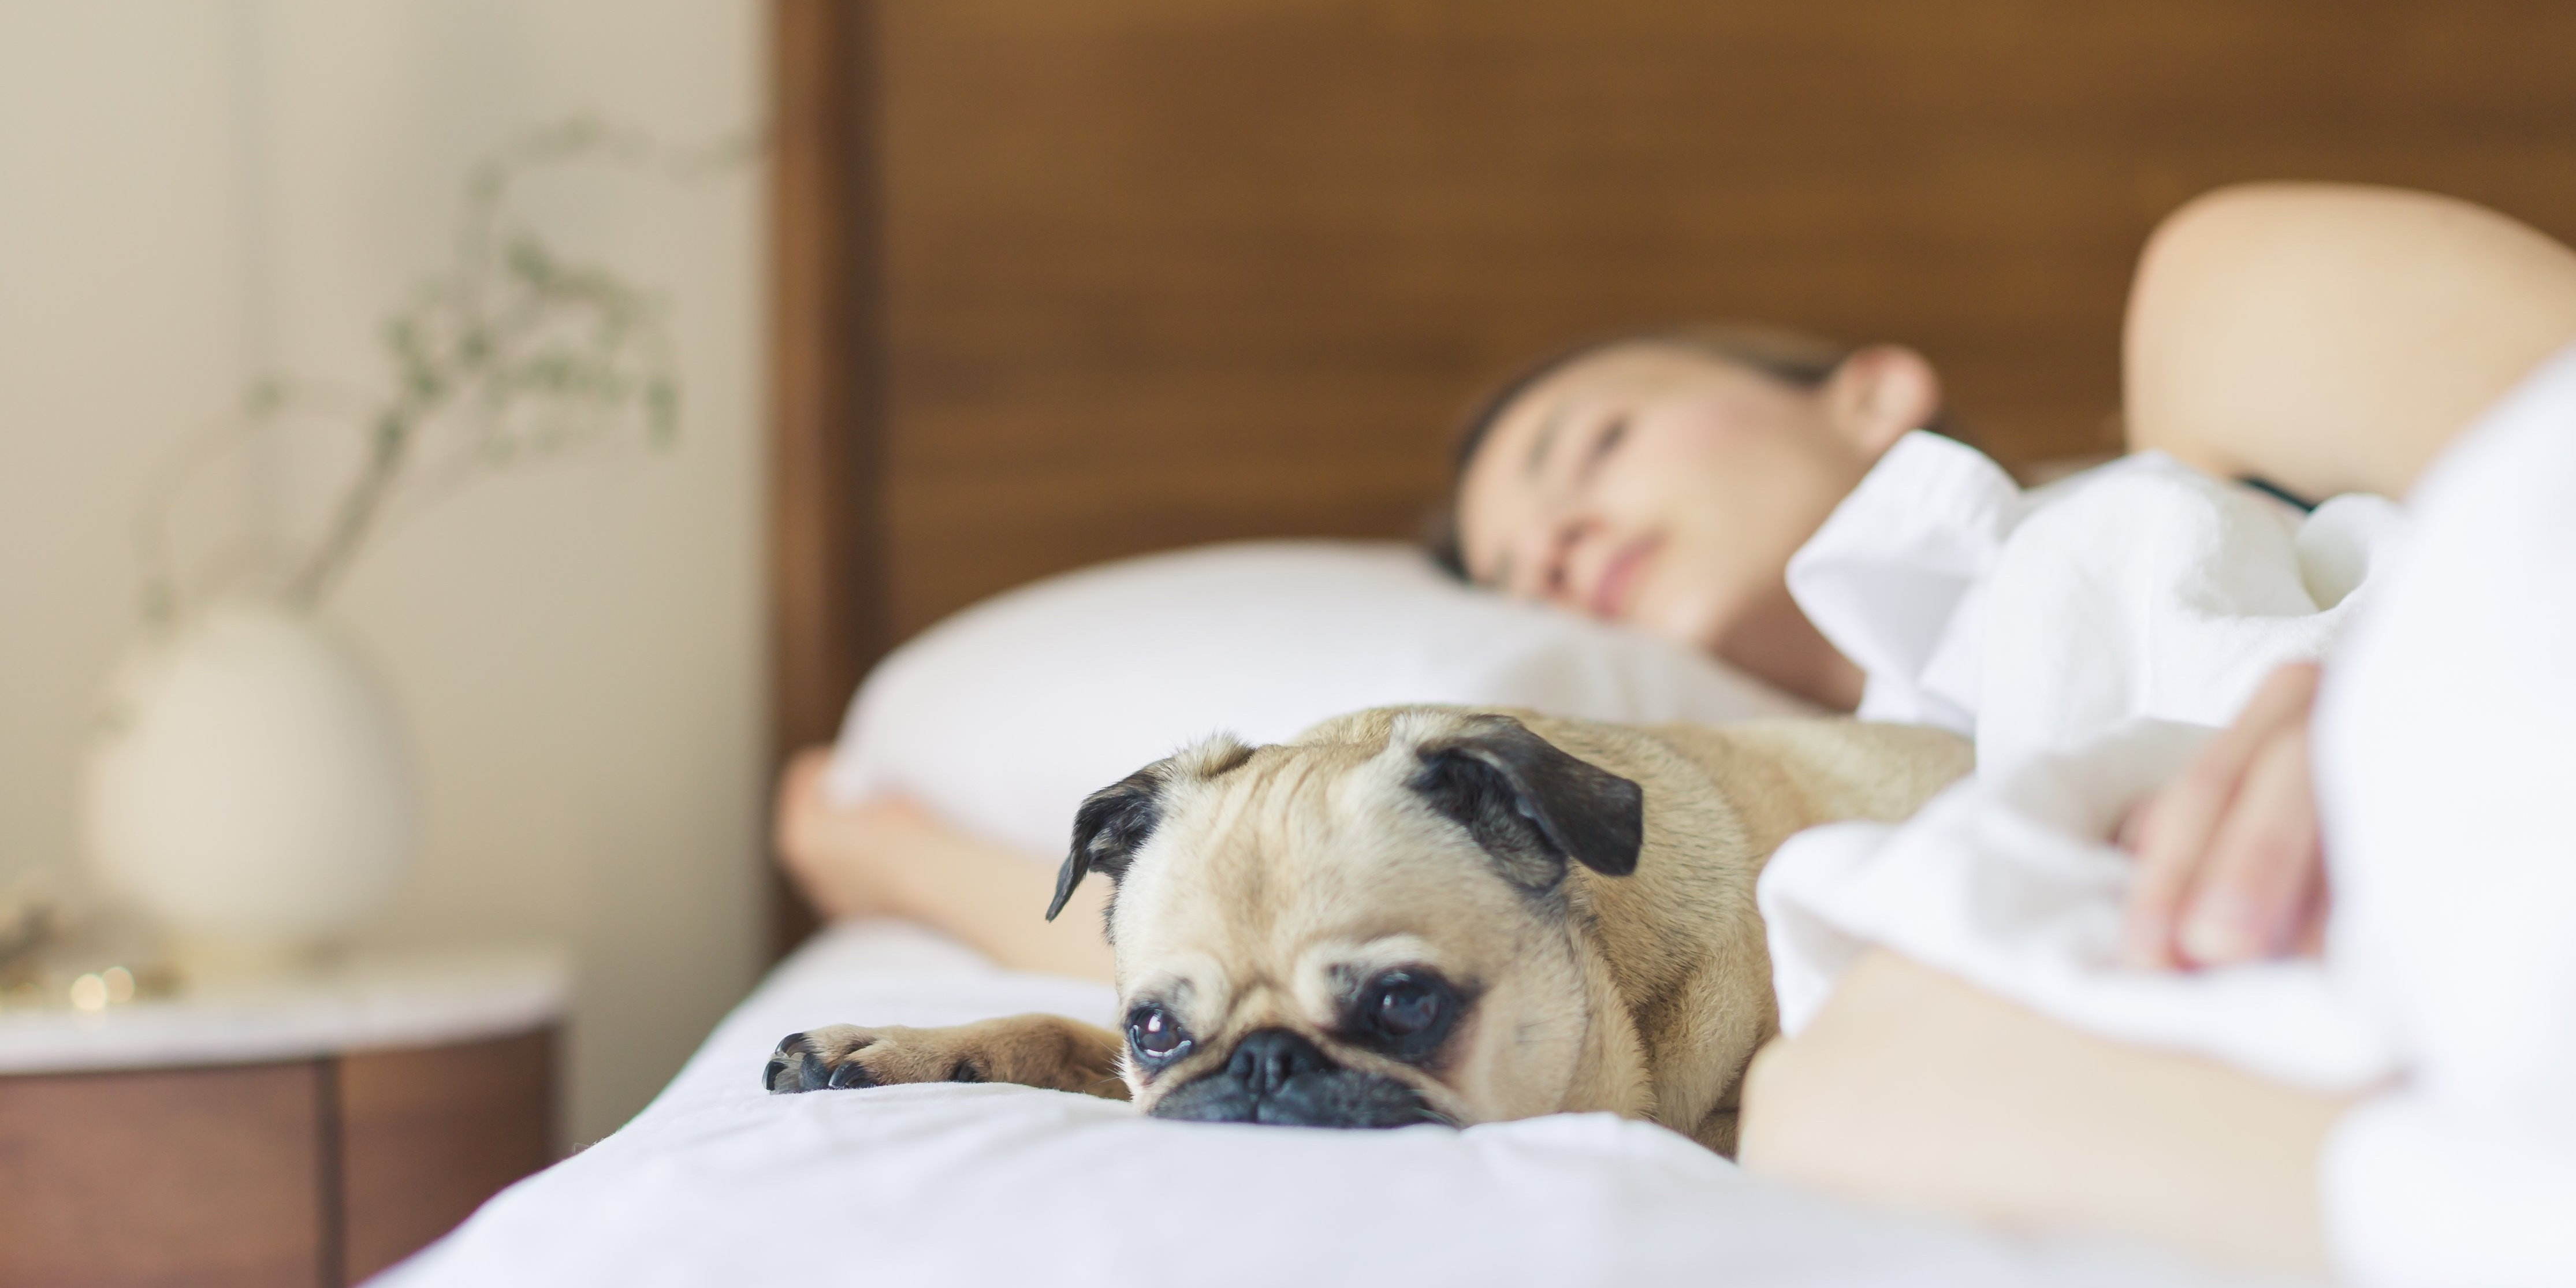 bed-pug-bedroom-911357-edited